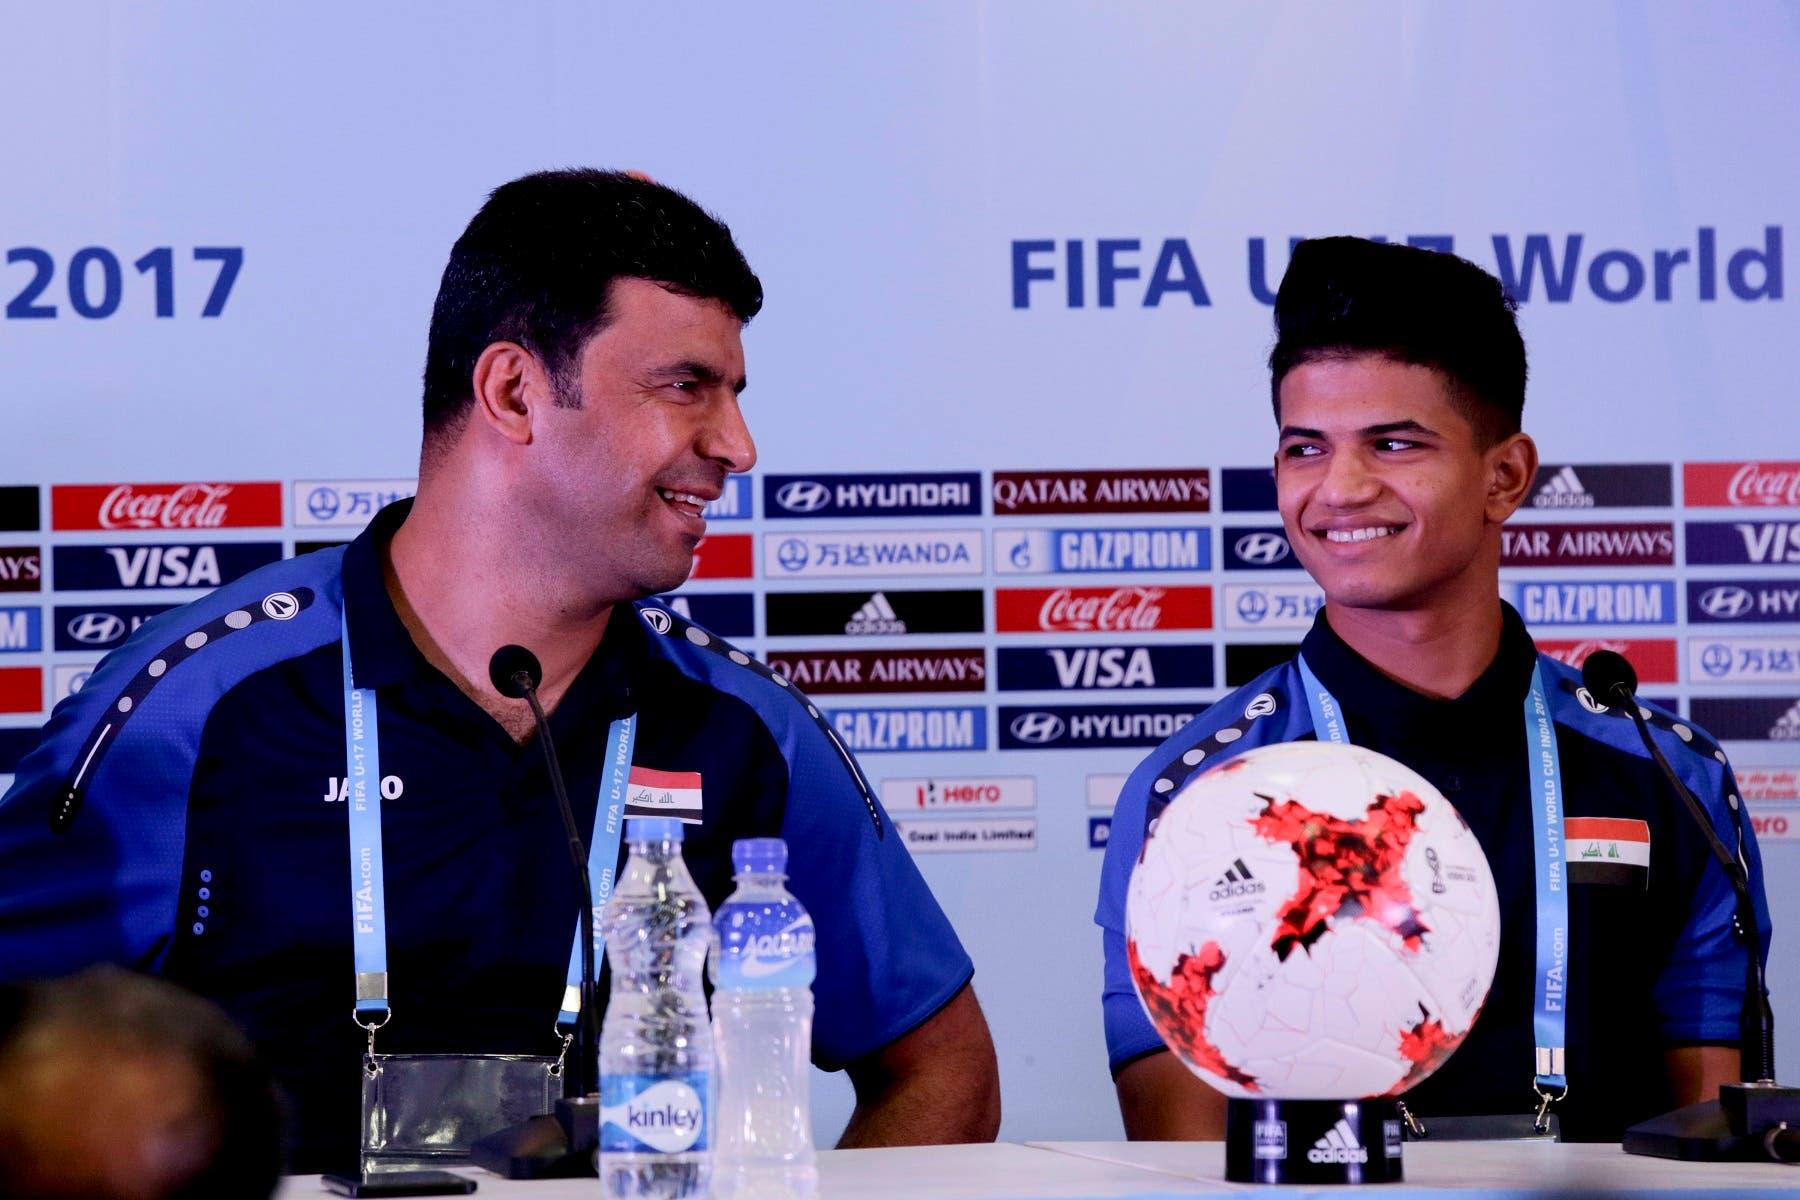 Iraqi coach Qahtan al-Rubaye and midfielder Saif Khalid at a press conference ahead of their FIFA U-17 World Cup match against Mexico. (AP)